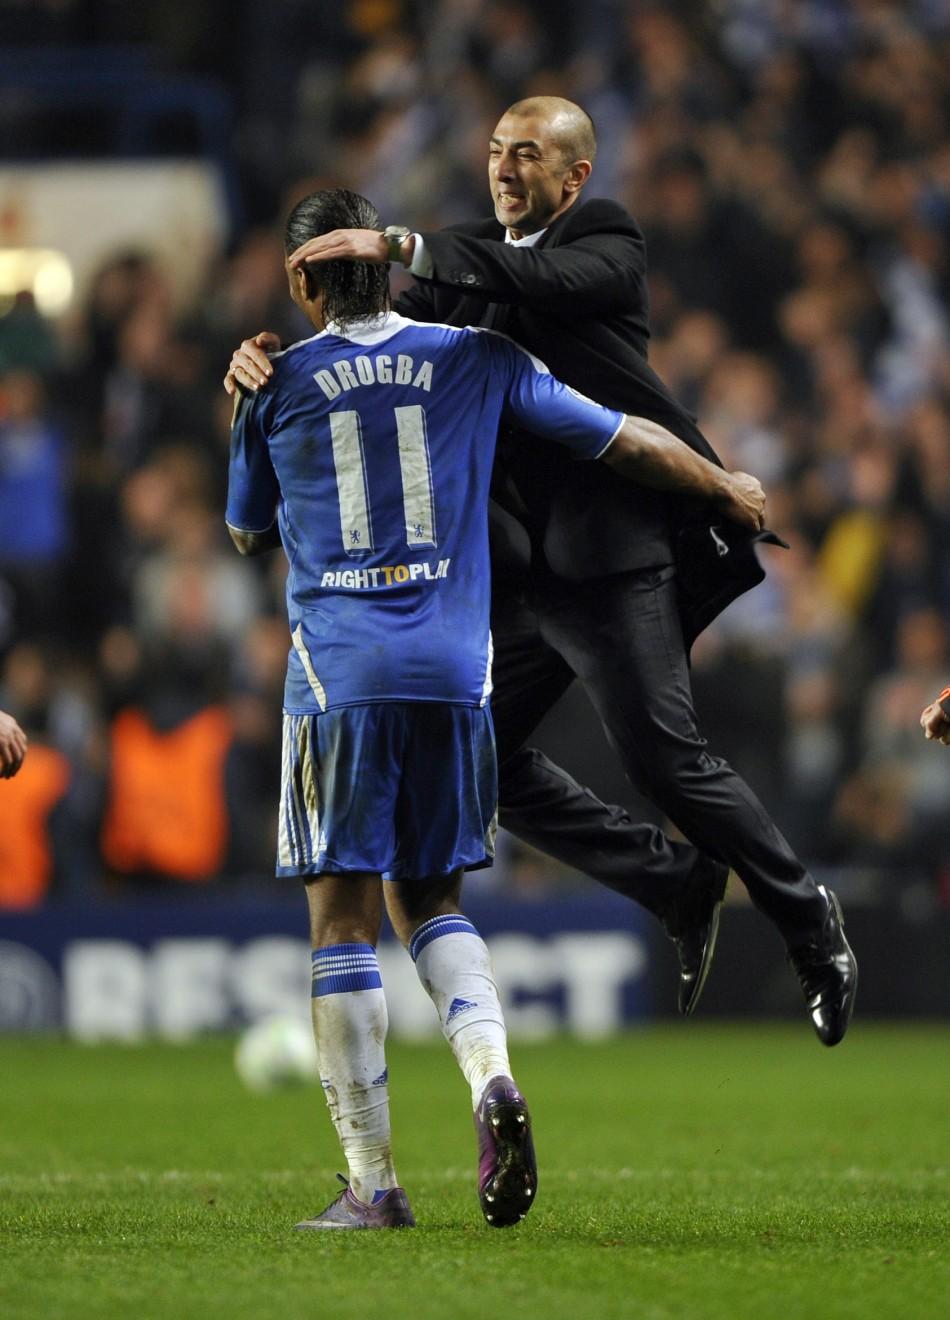 Roberto Di Matteo (R) and Didier Drogba